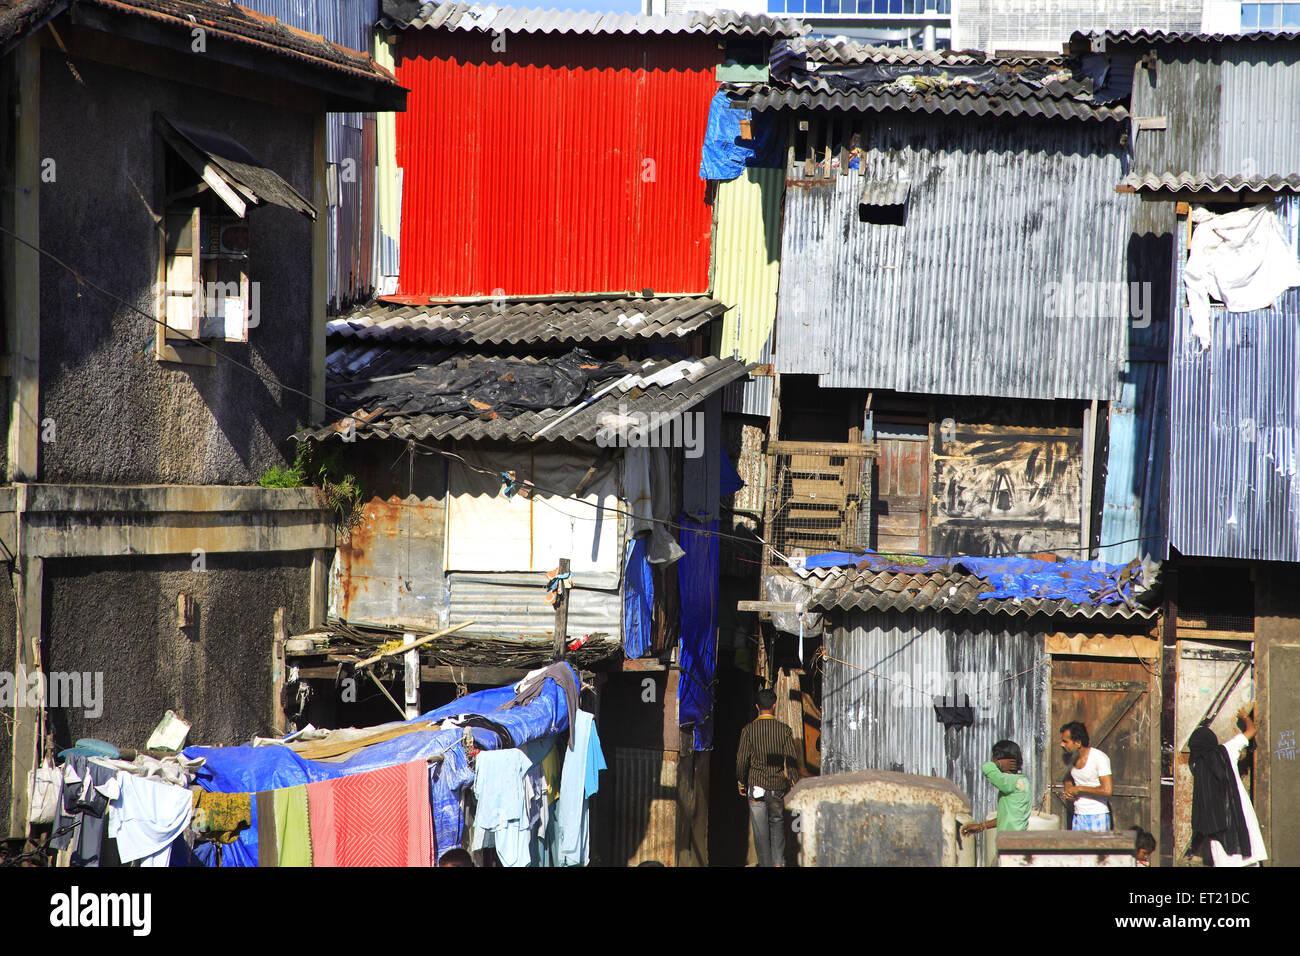 Drying cloth in slum ; Behram Naupada ; Anant Kanekar Marg ; Bandra ; Bombay Mumbai ; Maharashtra ; India 17 September - Stock Image